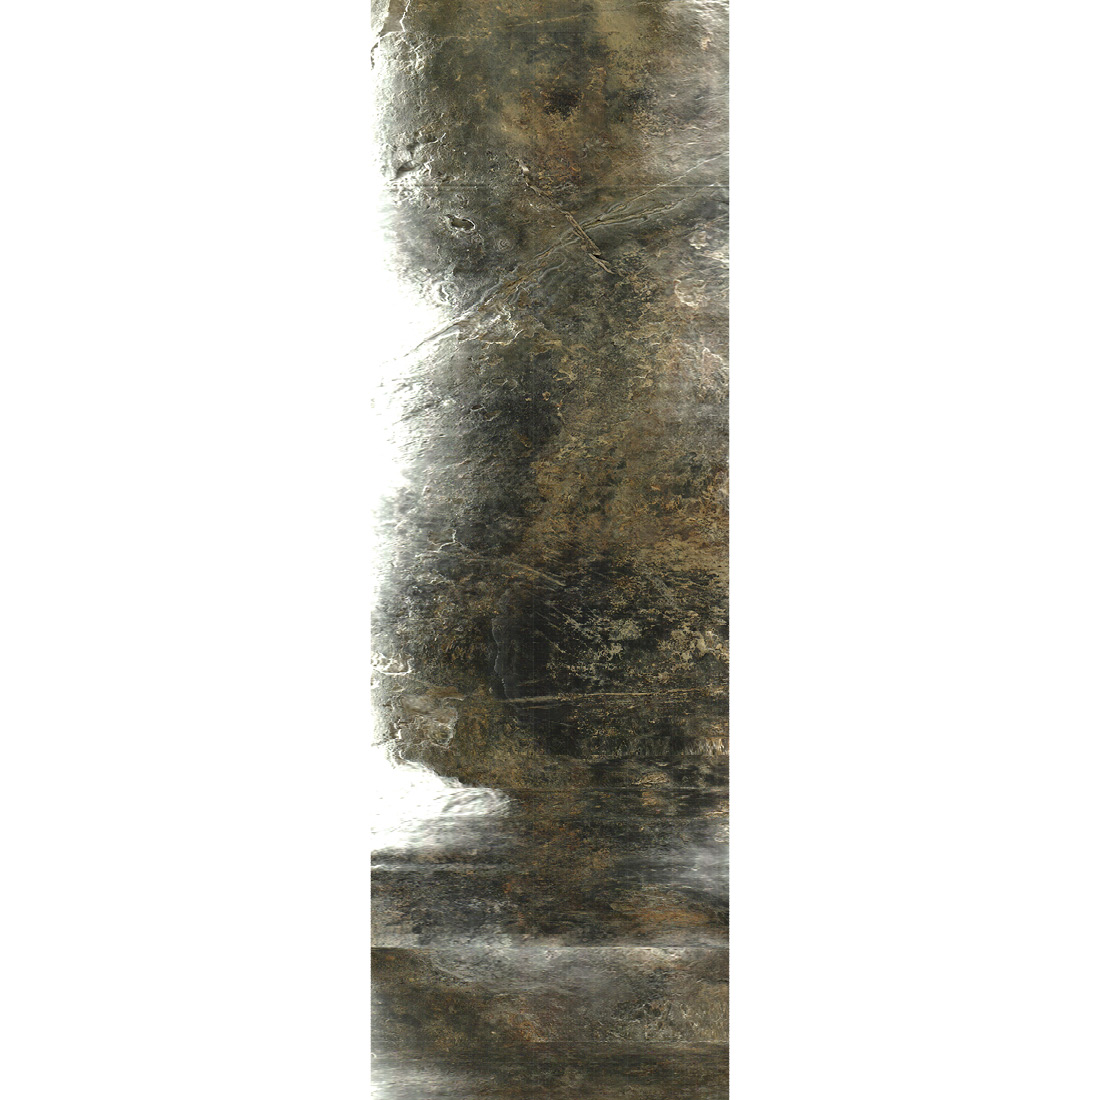 piedra plana matthieu bertea expo artsphalte arles